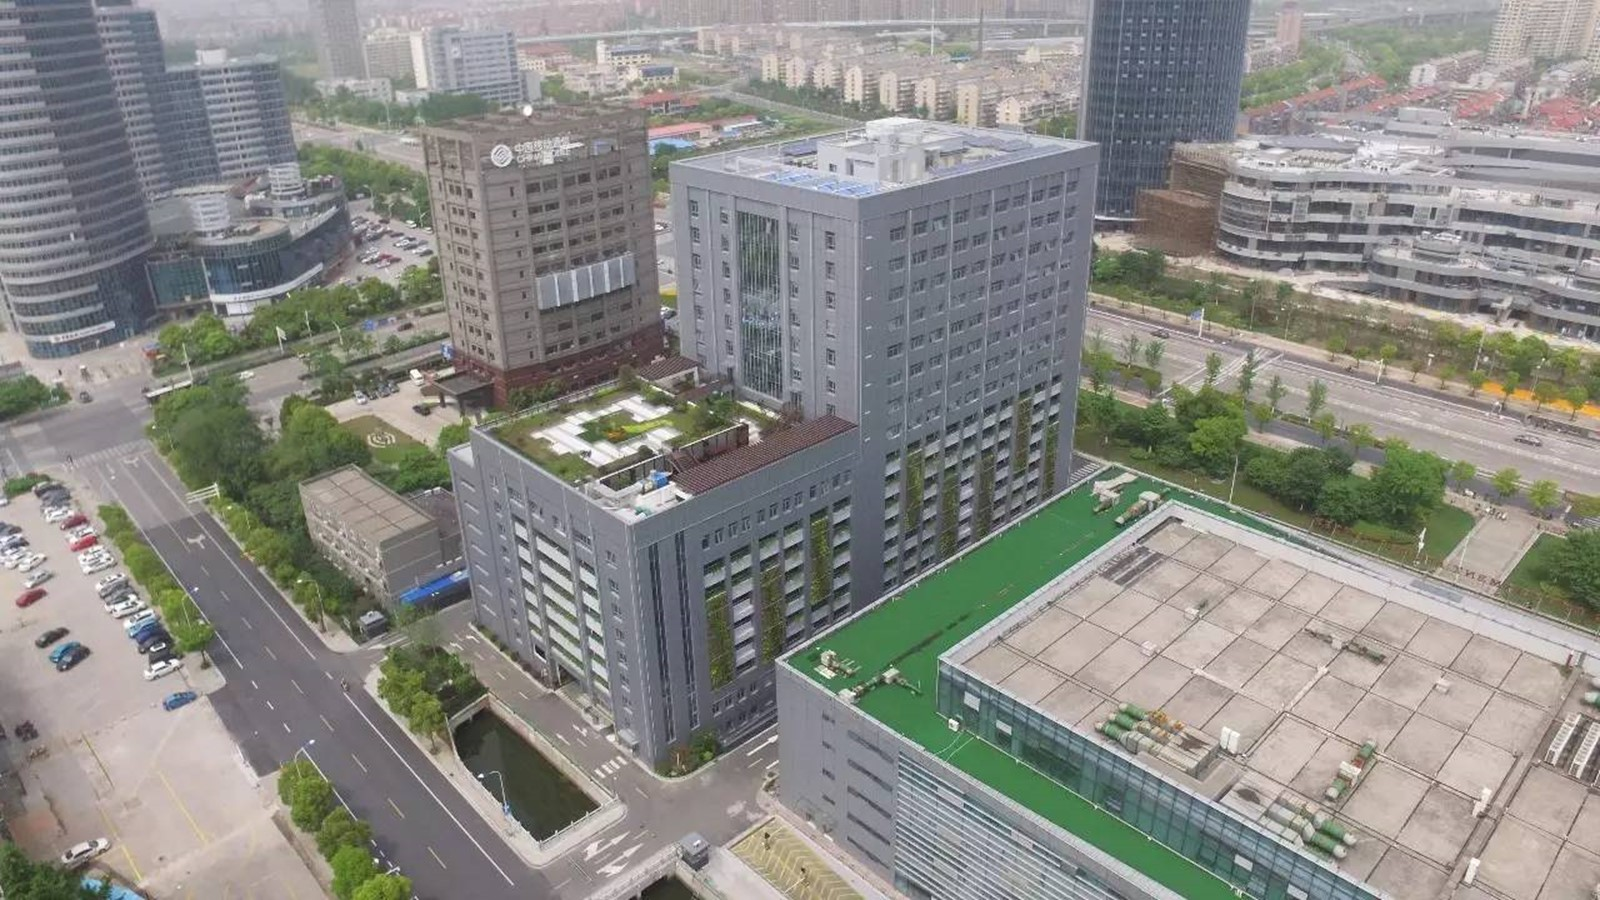 BIM技术在预制装配式建筑设计中的应用—-南通政务中心停车综合楼BIM设计总结